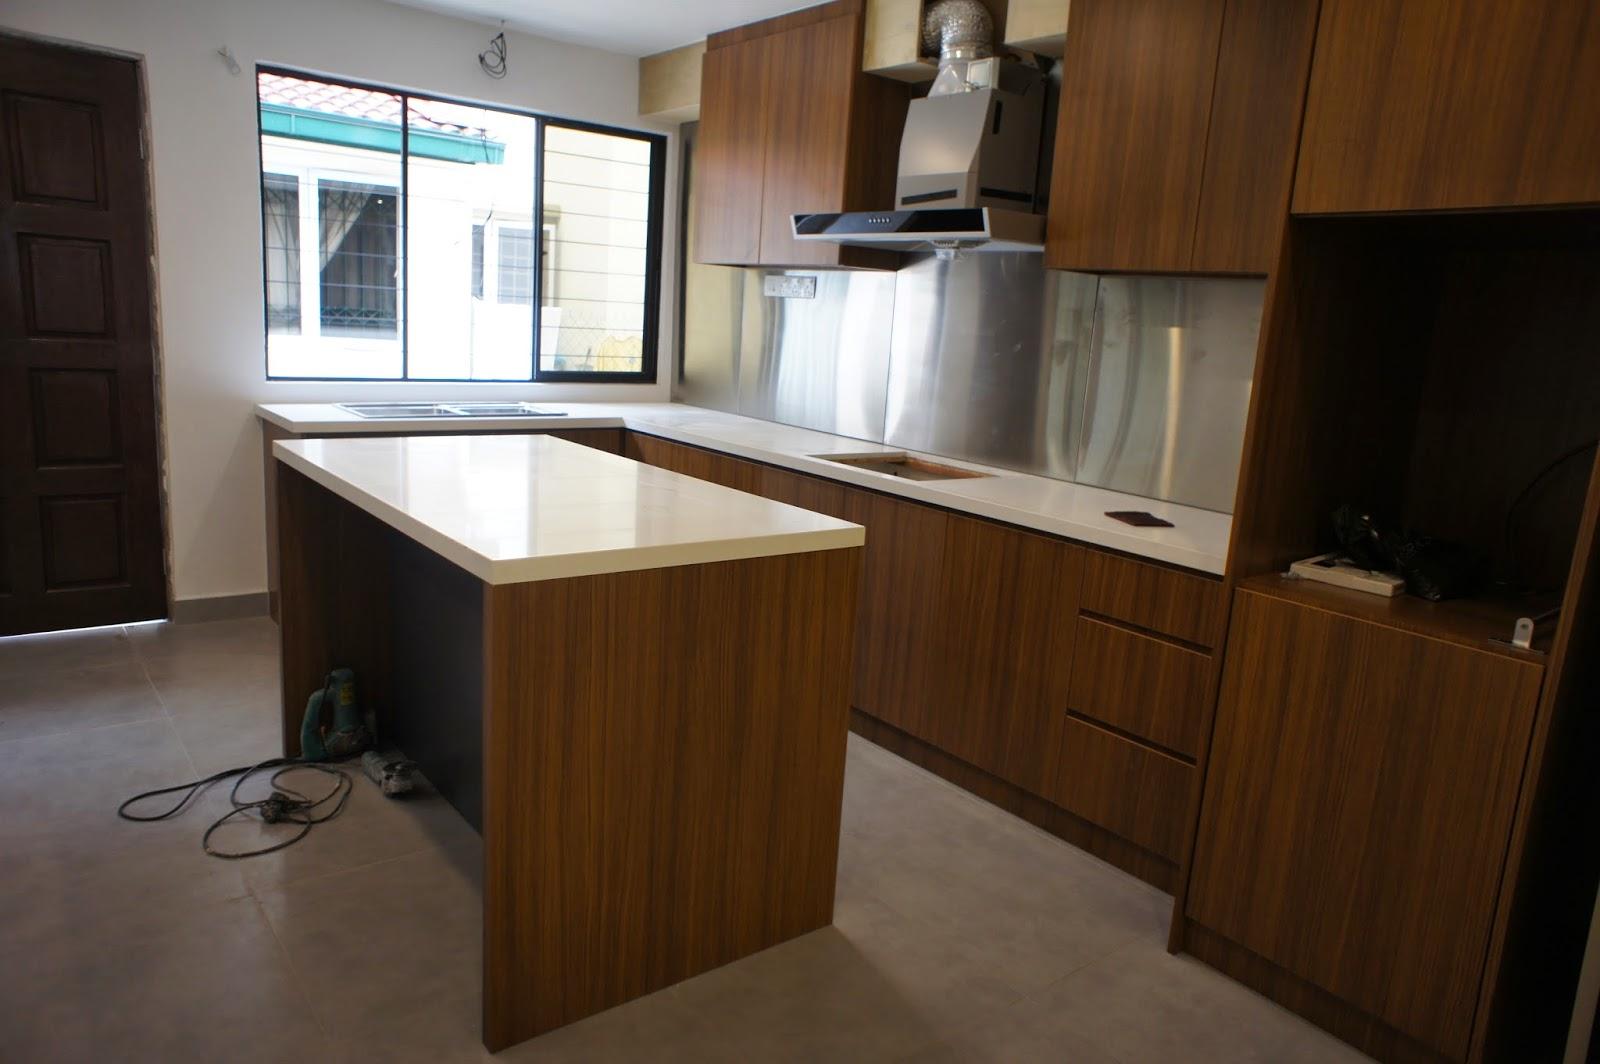 fukusu Kitchen Cabinet in awesome Formica Teak Allover  : DSC08792 from fukusu.blogspot.com size 1600 x 1064 jpeg 151kB